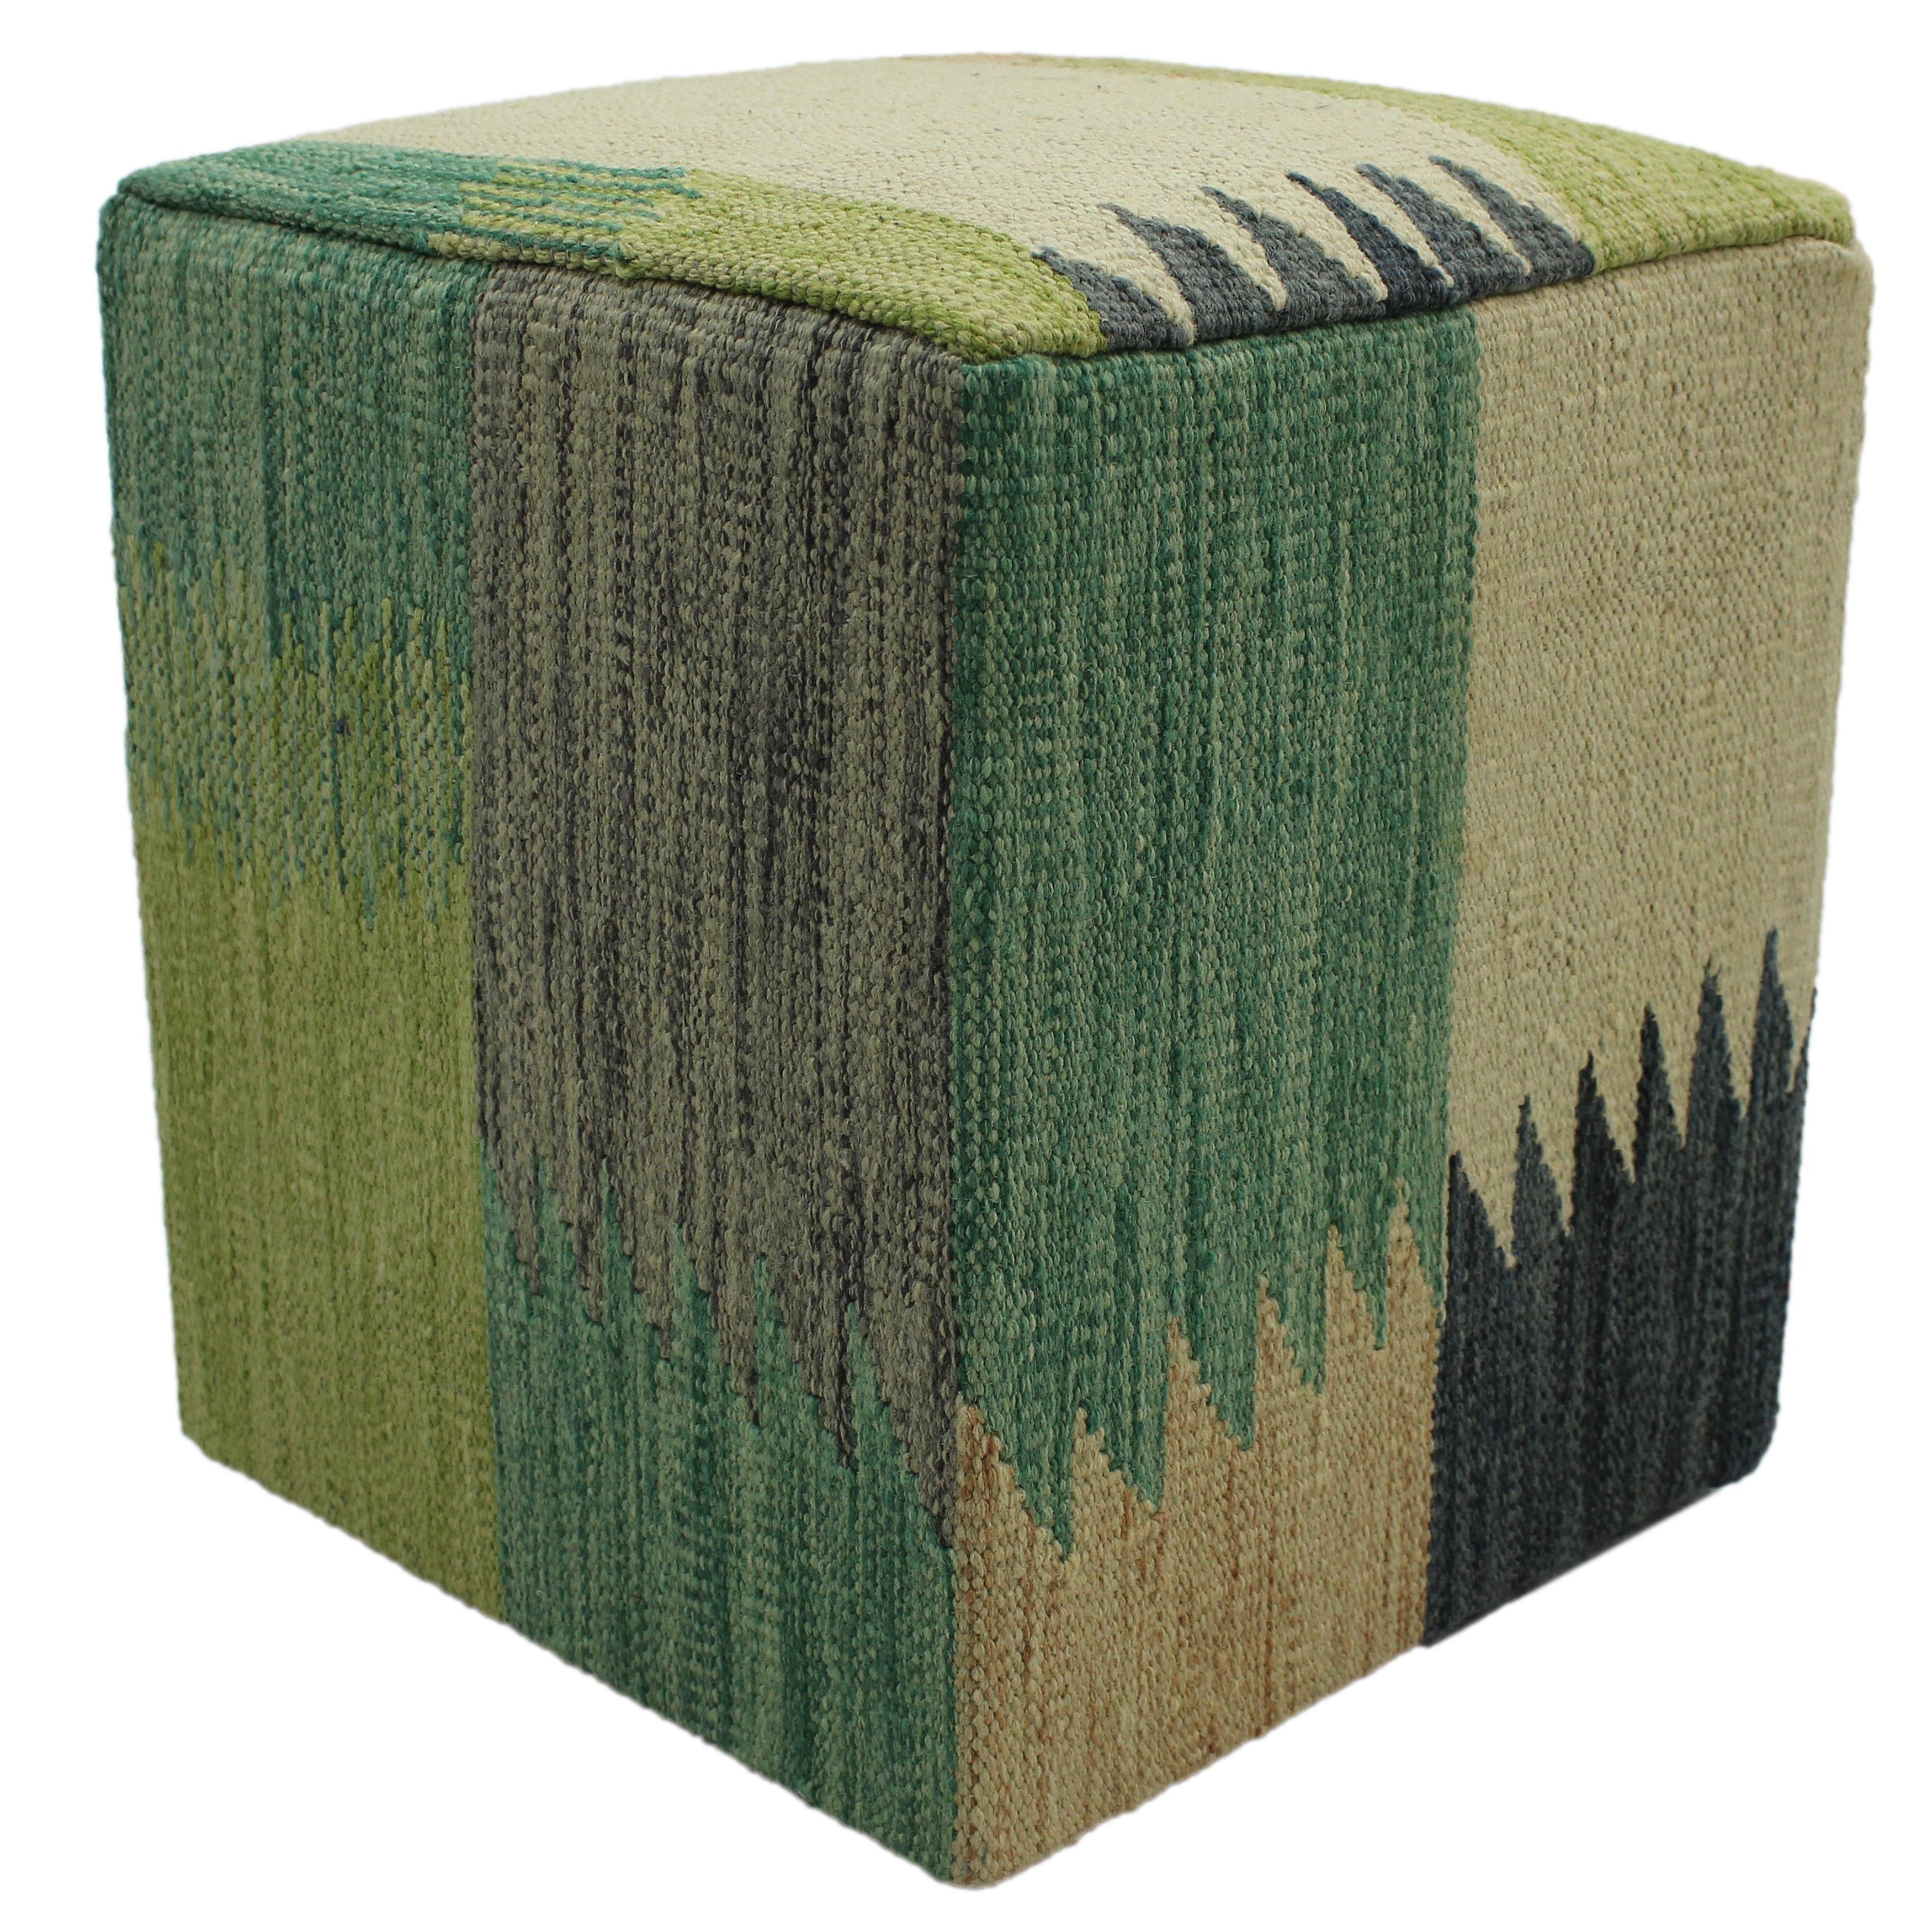 Shop Arshs Fine Rugs Hammonds Handmade Ivory Tan Kilim Upholstered Ottoman On Sale Overstock 27747873